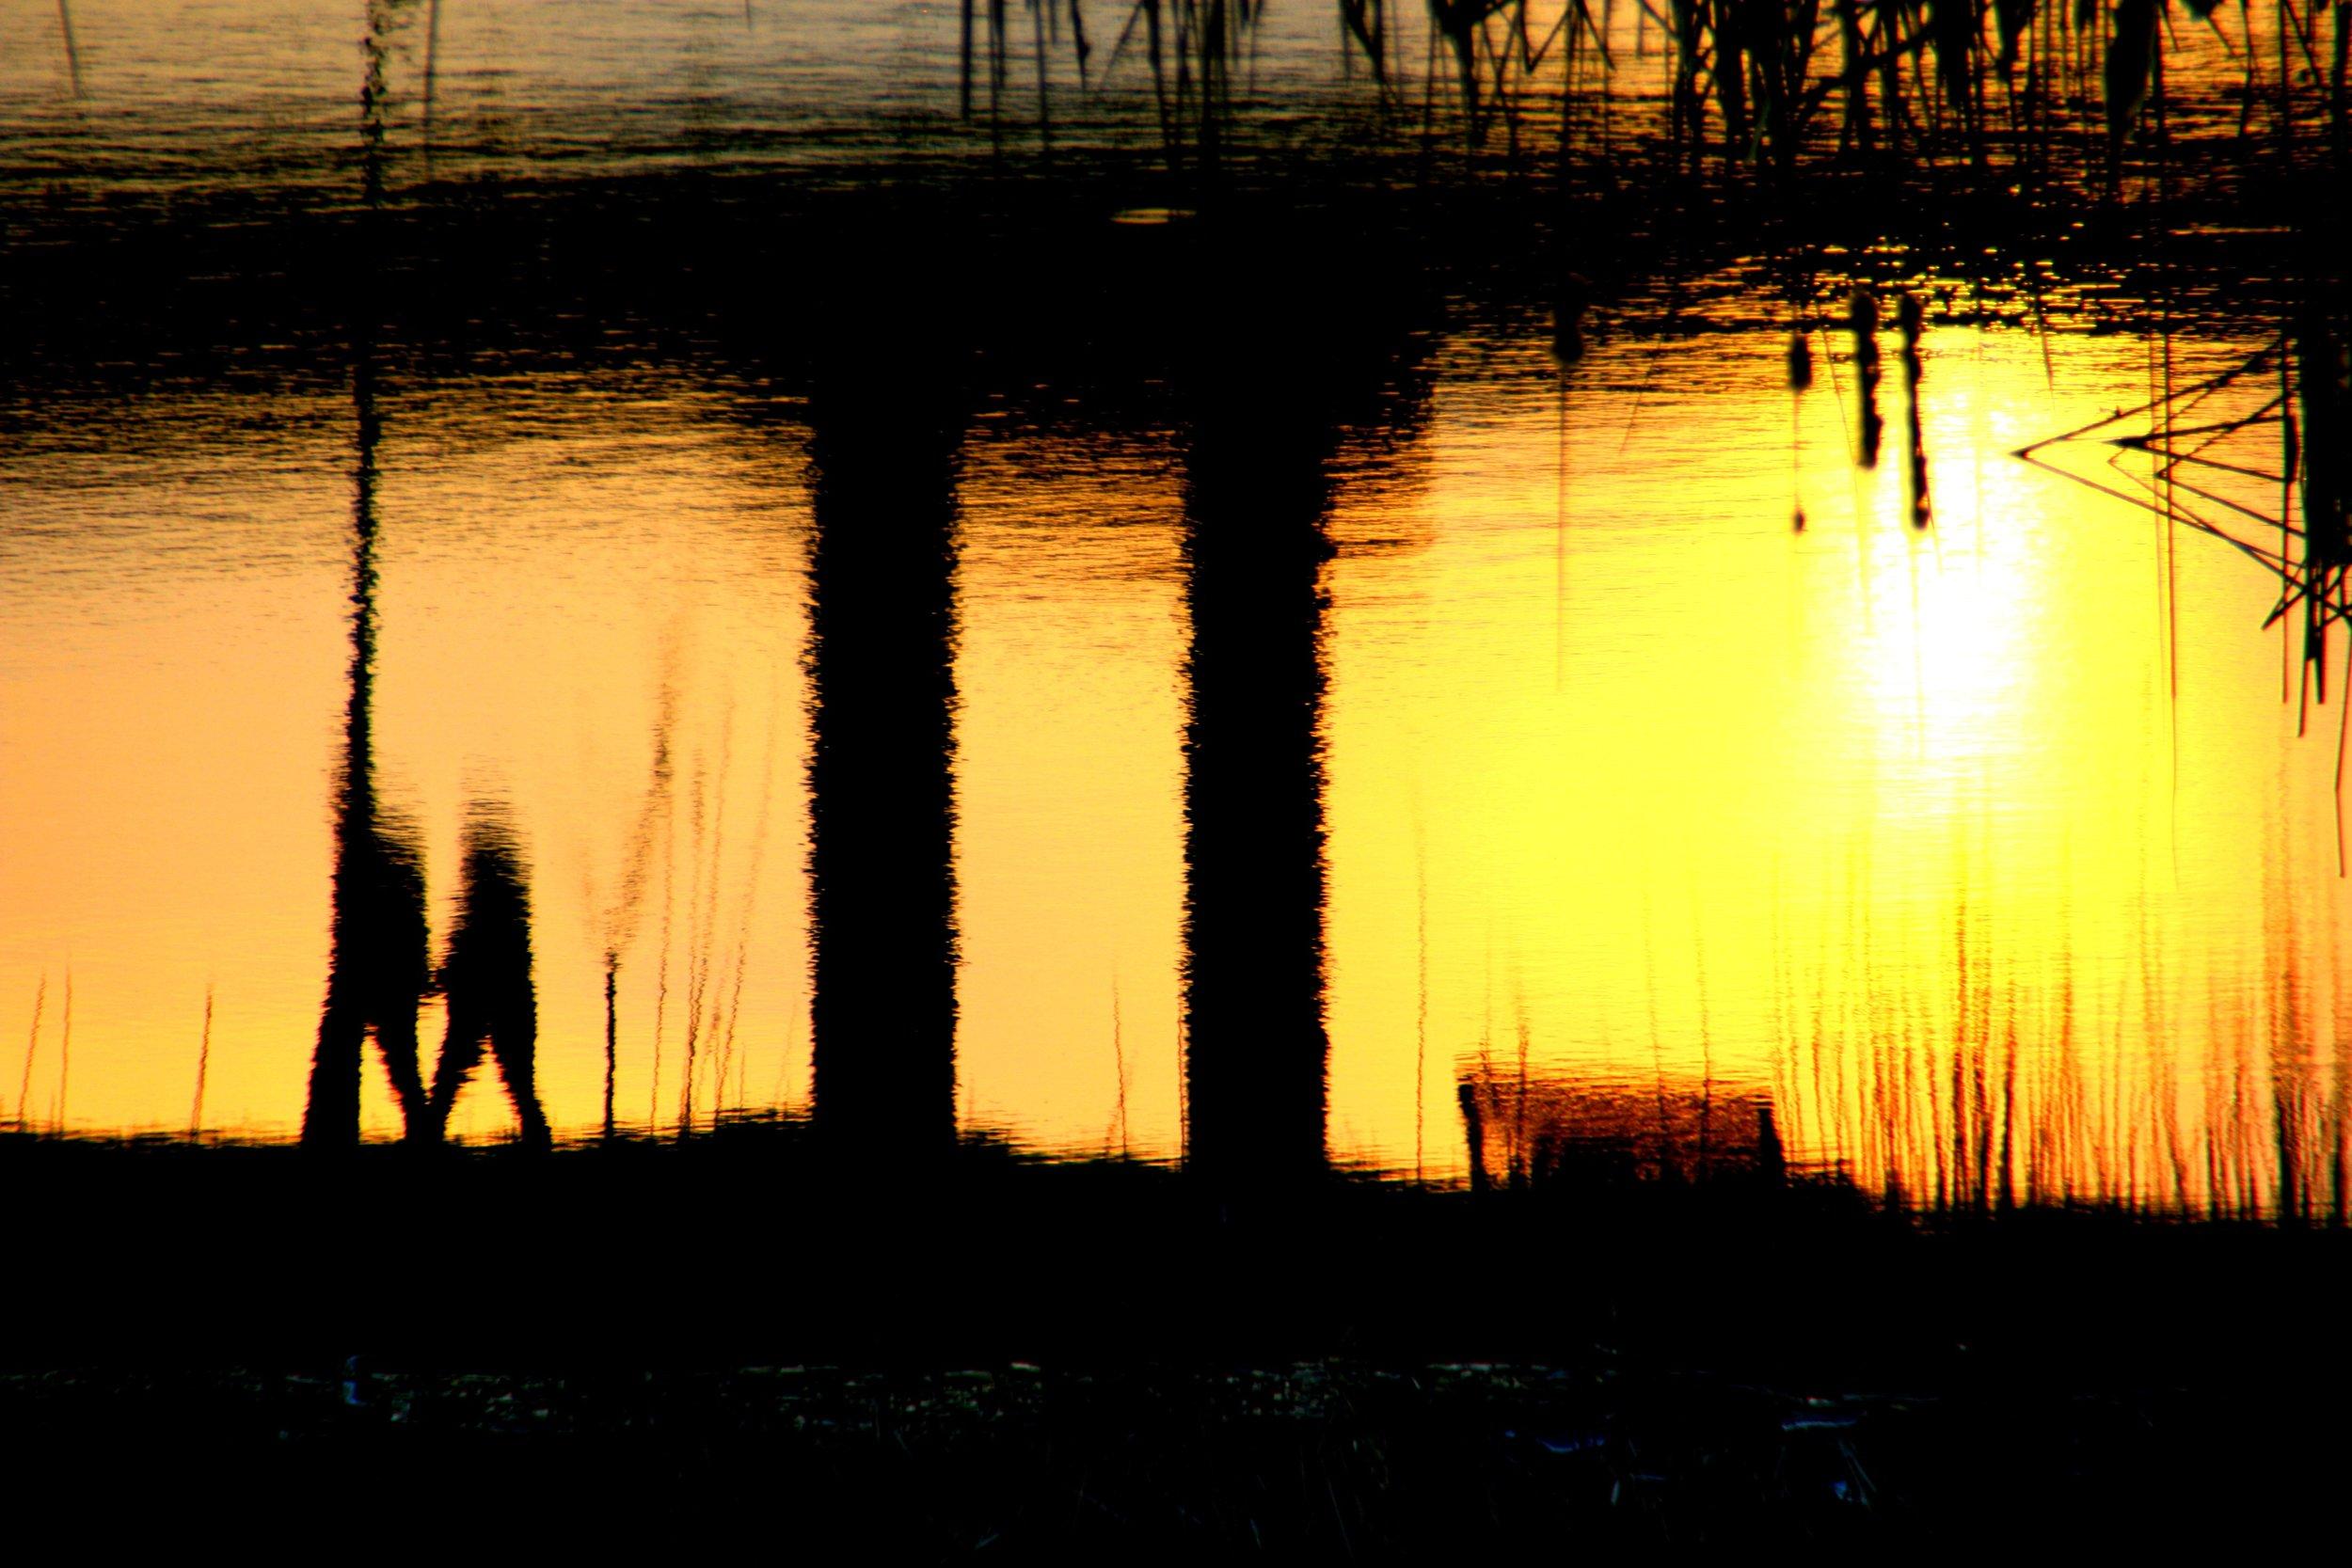 water-horizon-light-sun-sunrise-sunset-1081241-pxhere.com.jpg